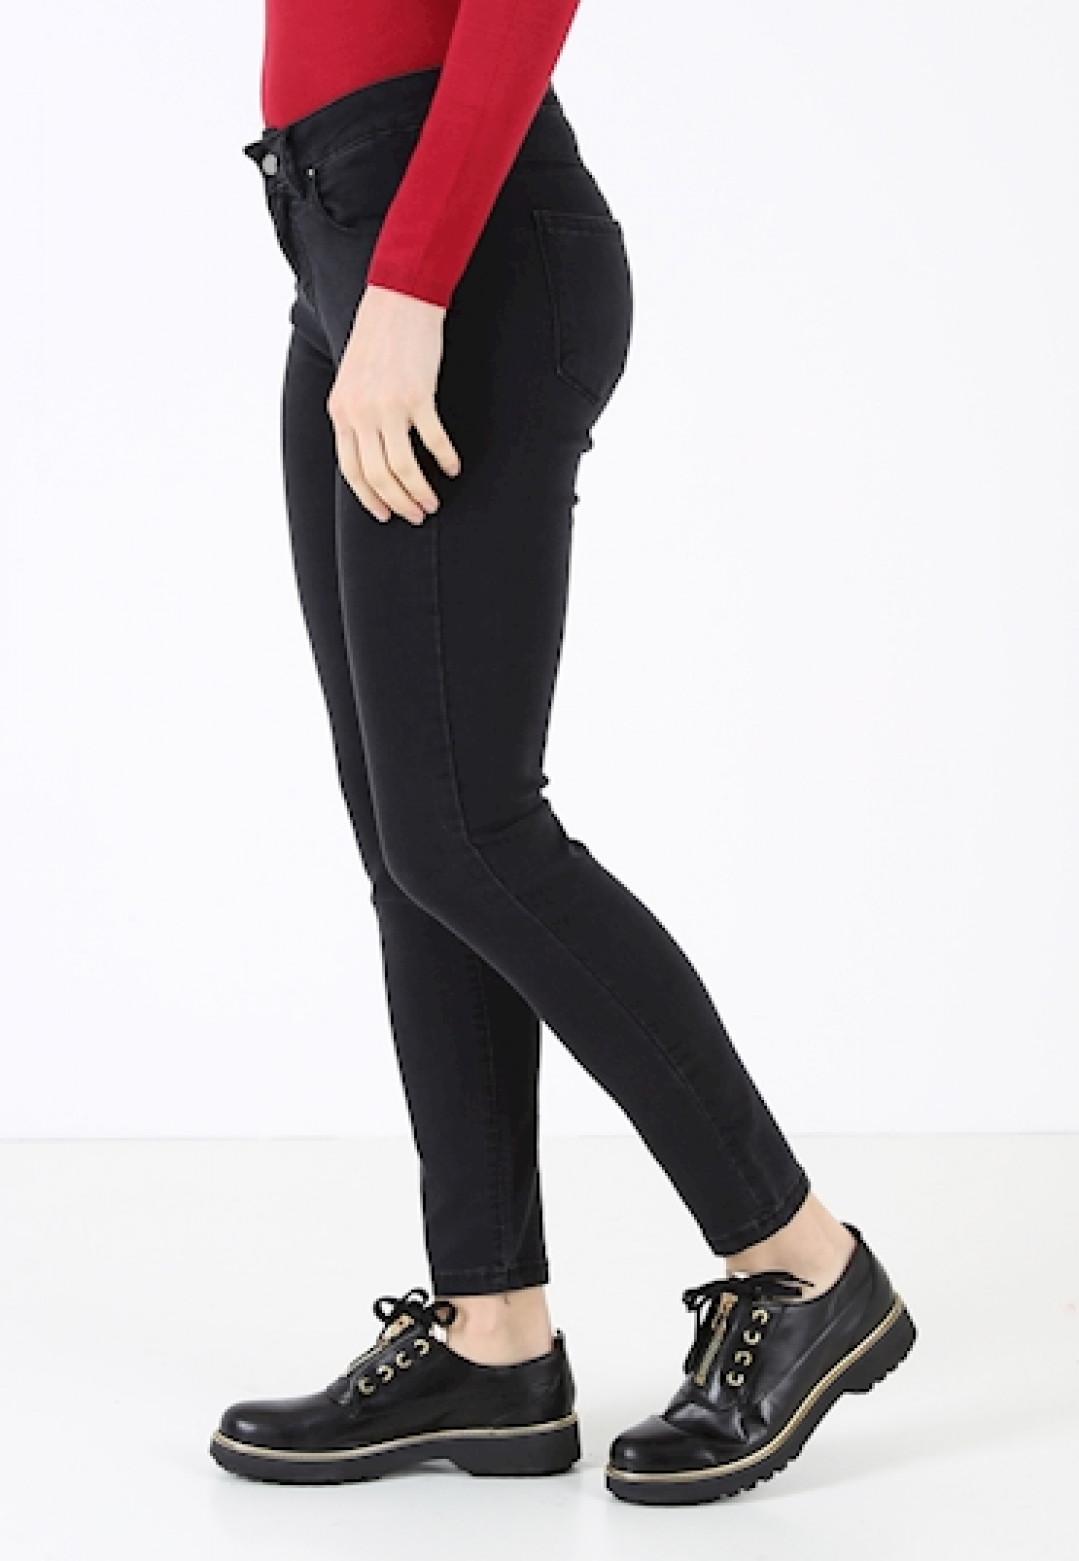 Girl 3750sc30 Fly Fly Jeans Girl 3750sc30 Jeans Fly Girl Jeans 1JTclFK3u